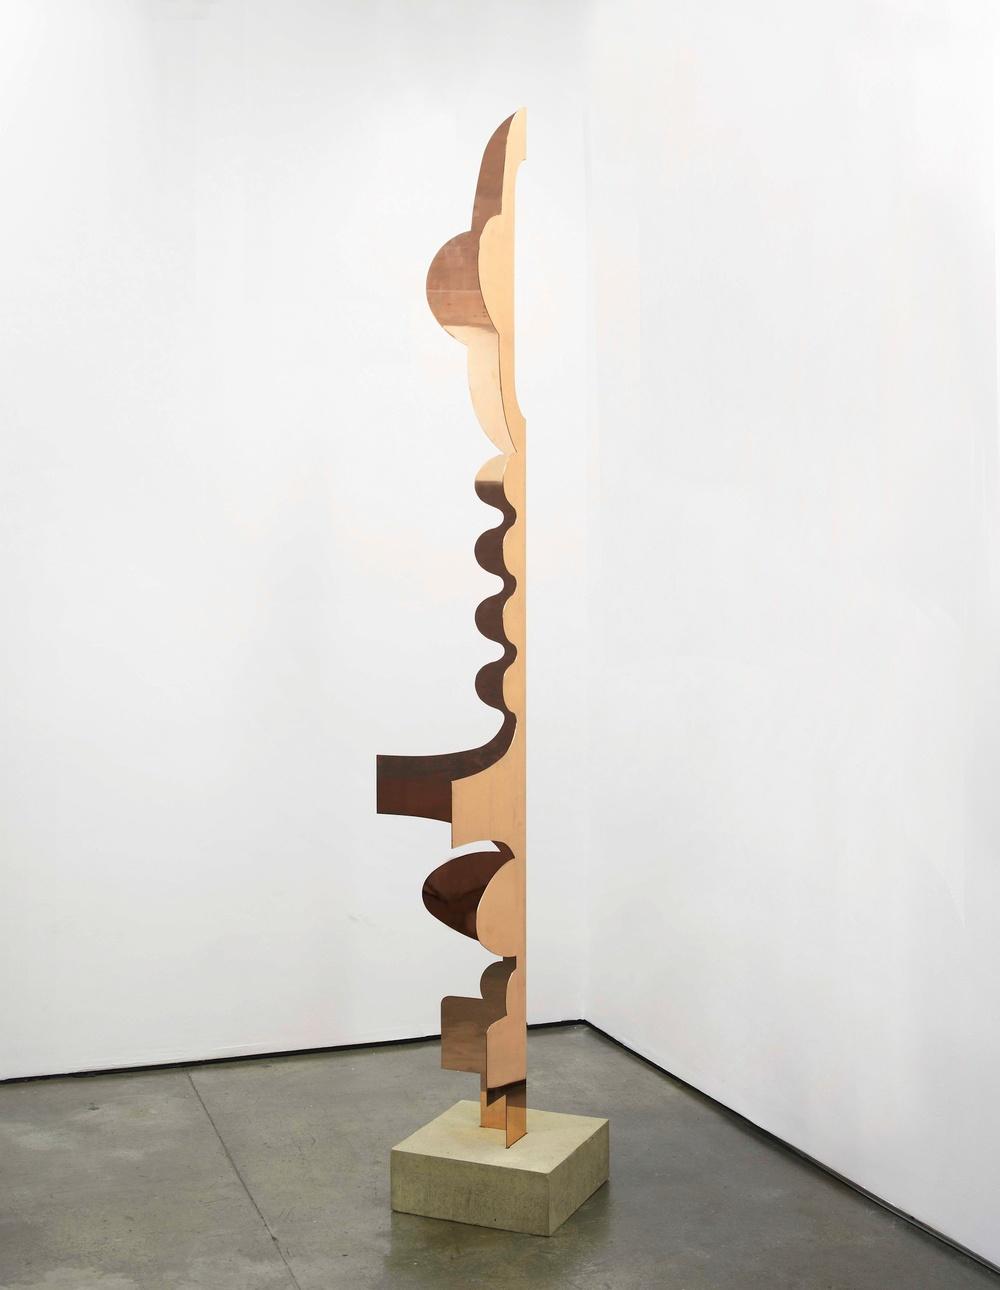 Centrefold 2011 Copper, concrete base 246 x 54 x 54 cm / 96.9 x 21.3 x 21.3 in